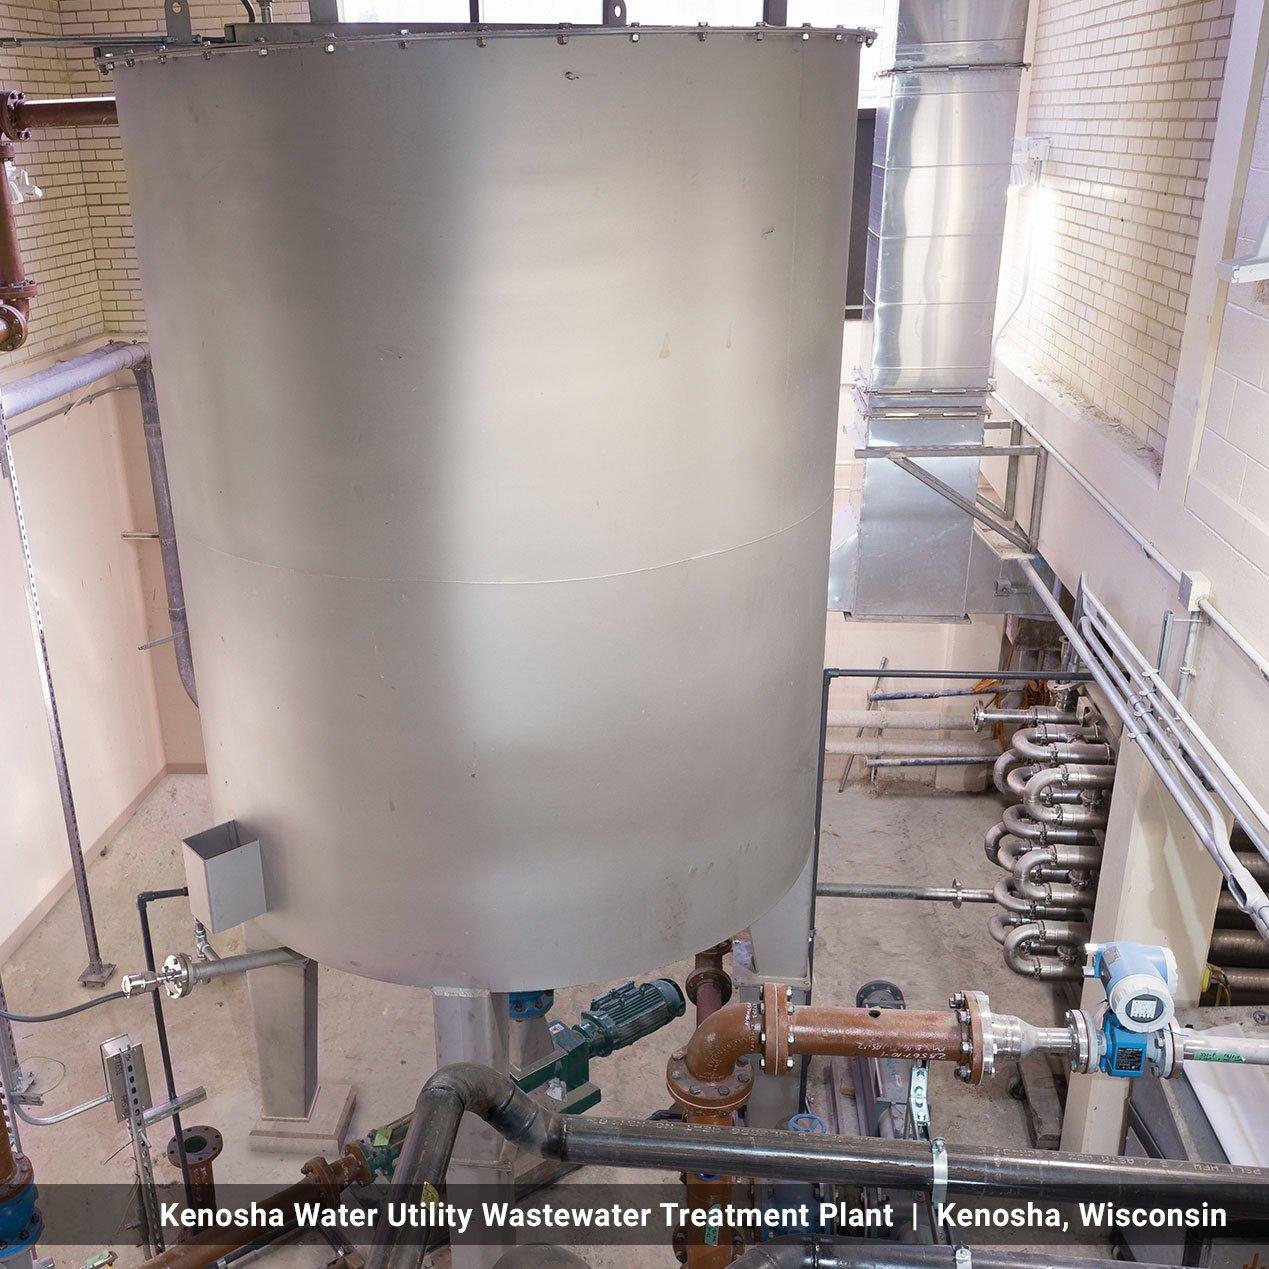 Install-Kenosha-Water-Utility-Wastewater-Treatment-Plant